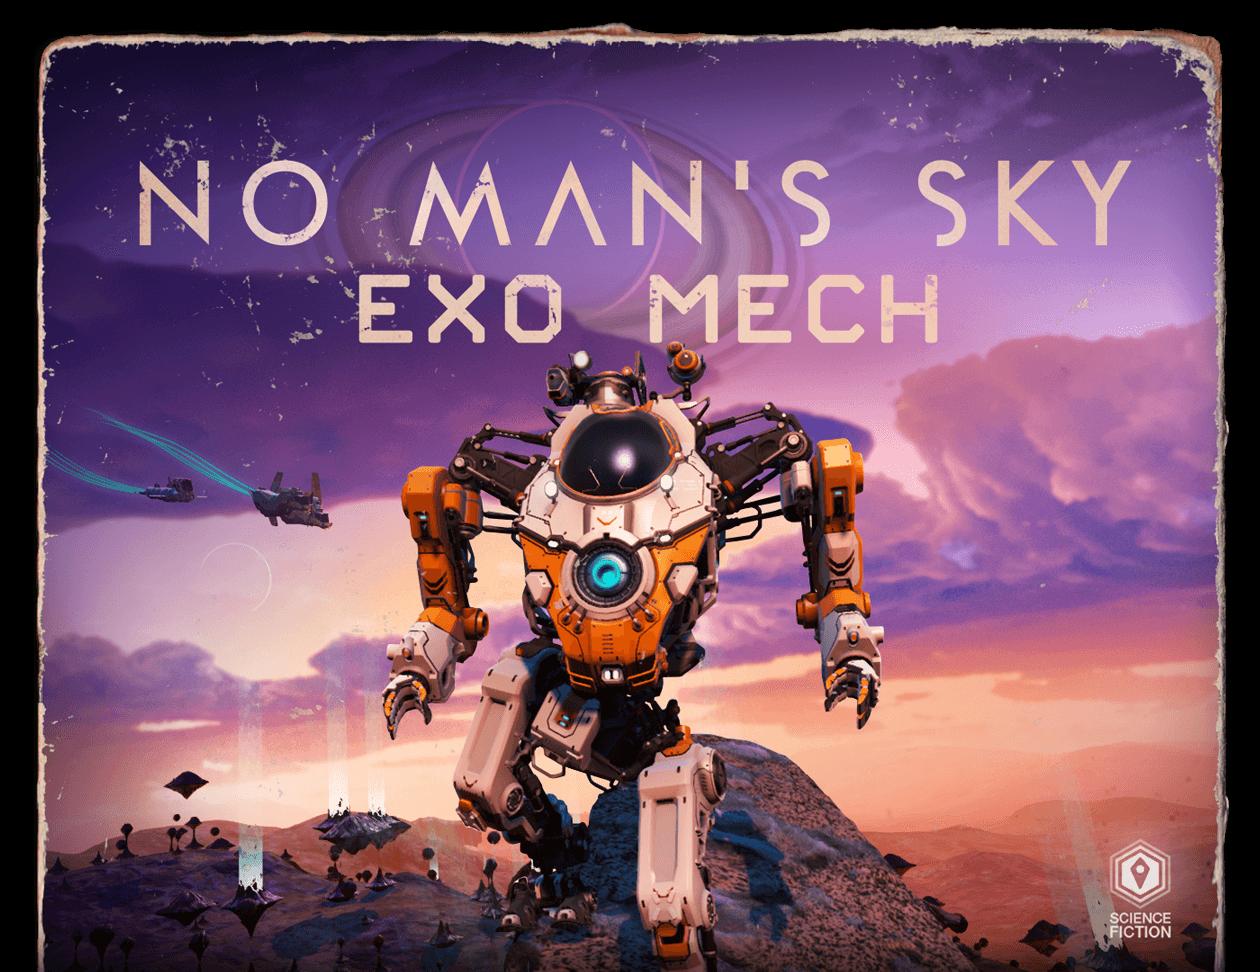 آپدیت Exo Mech بازی No Man's Sky